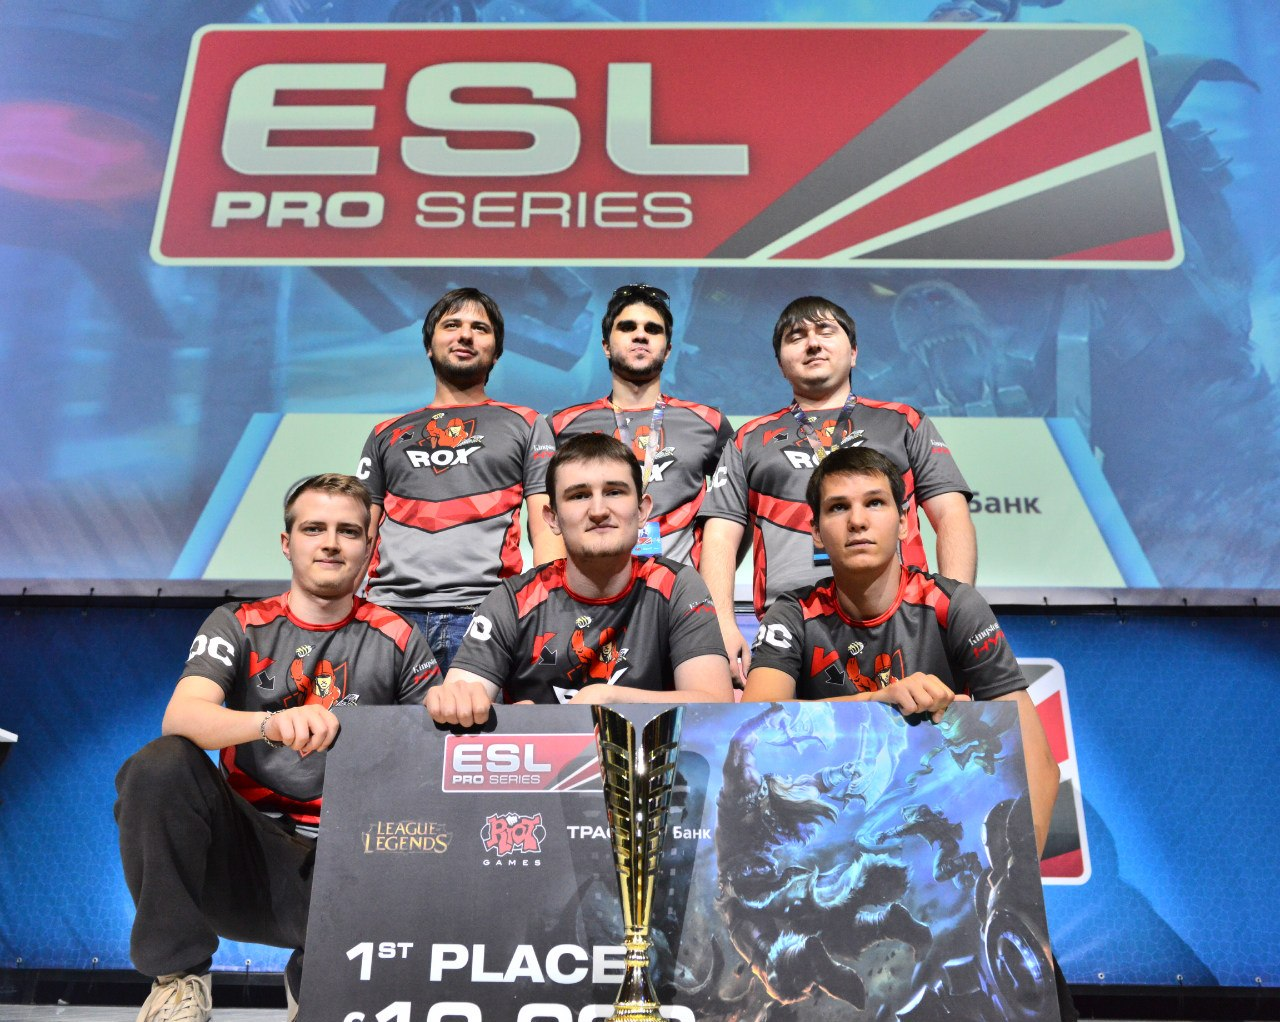 Esl Pro Series